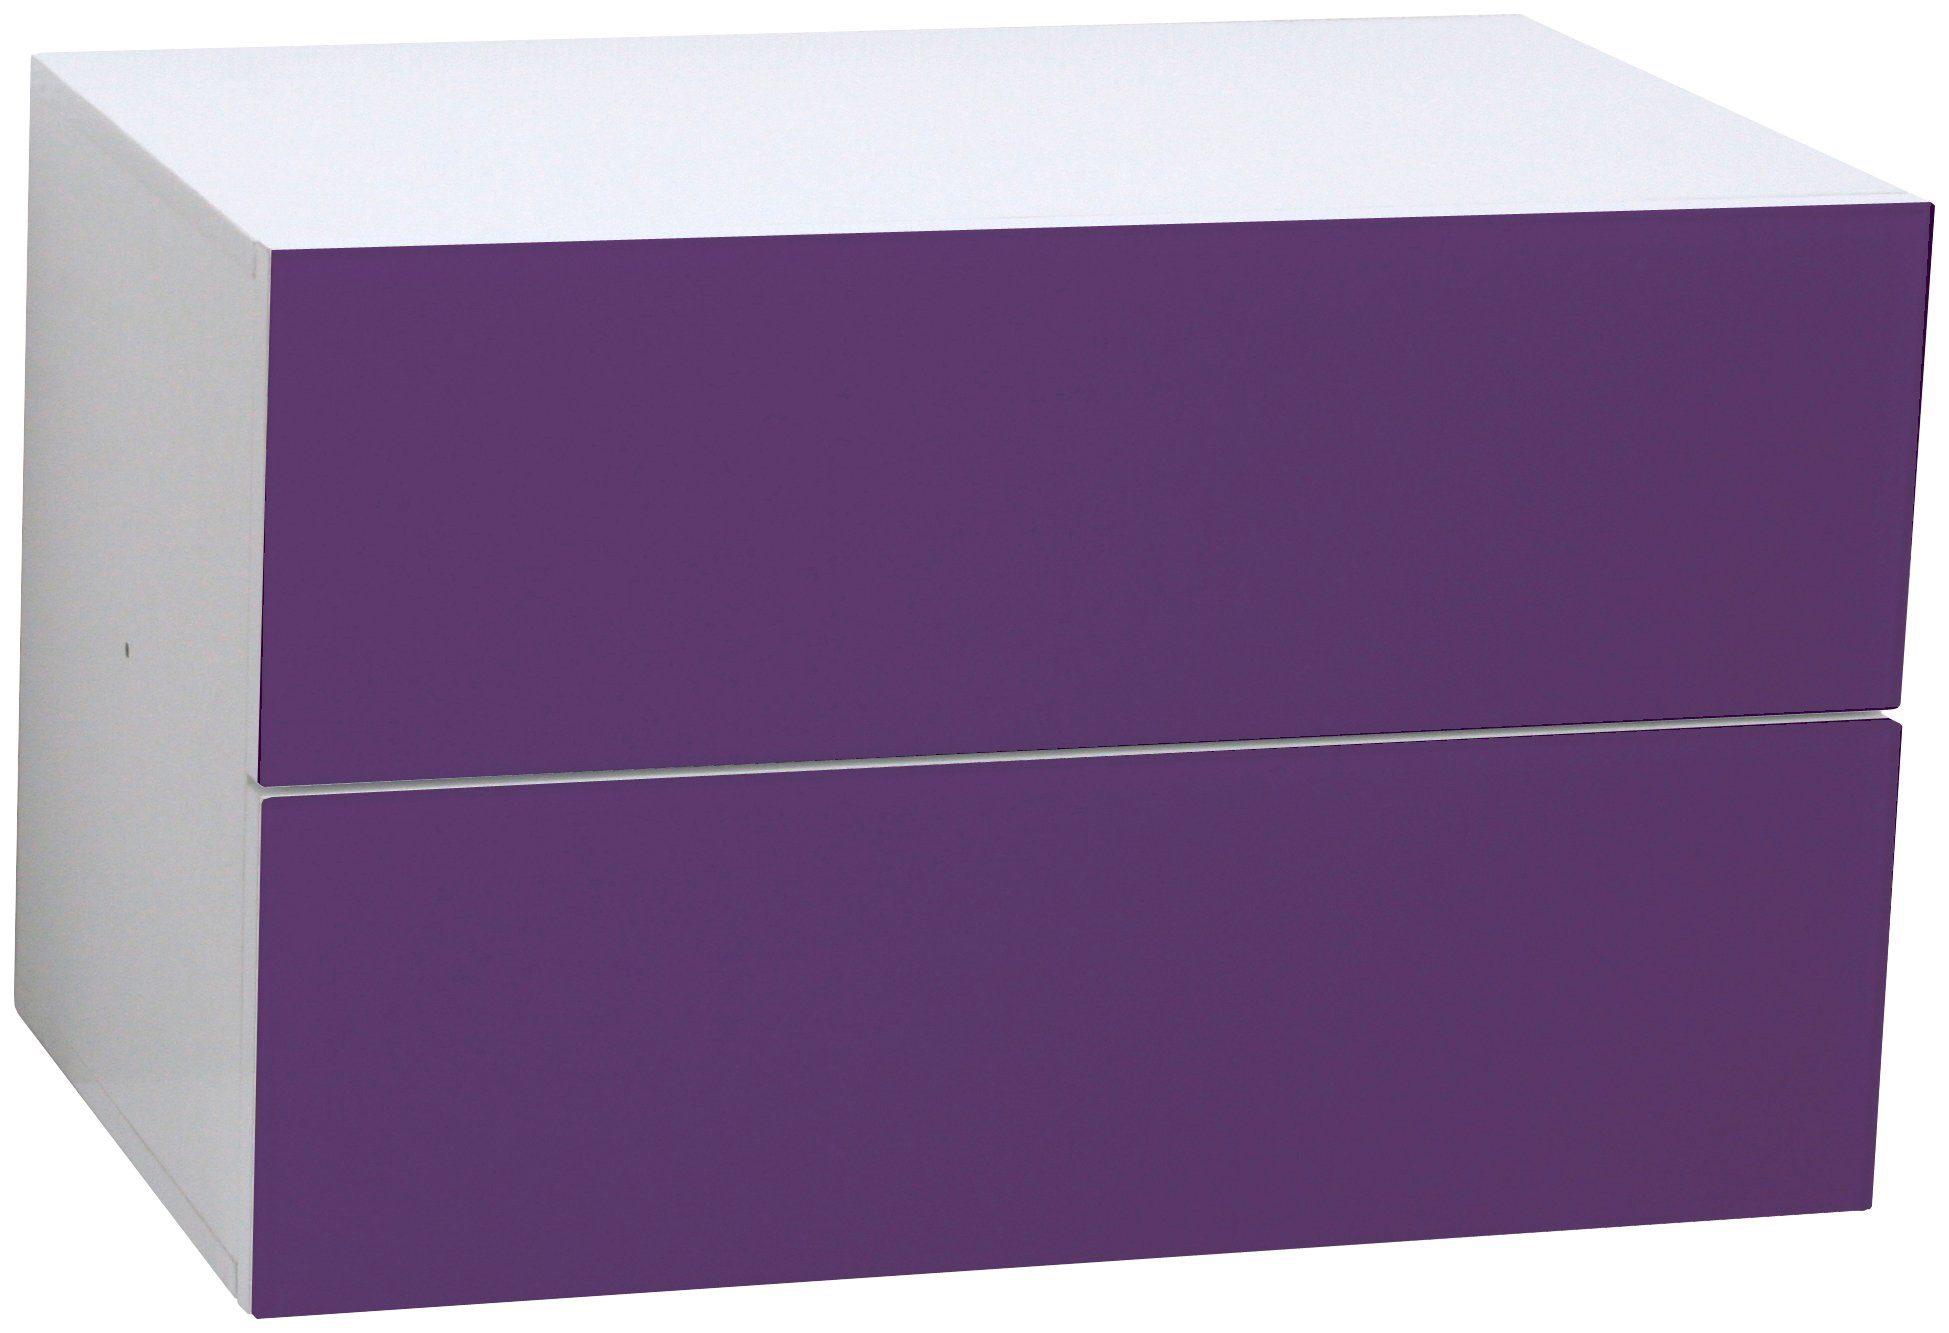 PHOENIX Schubladenelement »Atlanta«, B/H/T: 55x34x38 cm